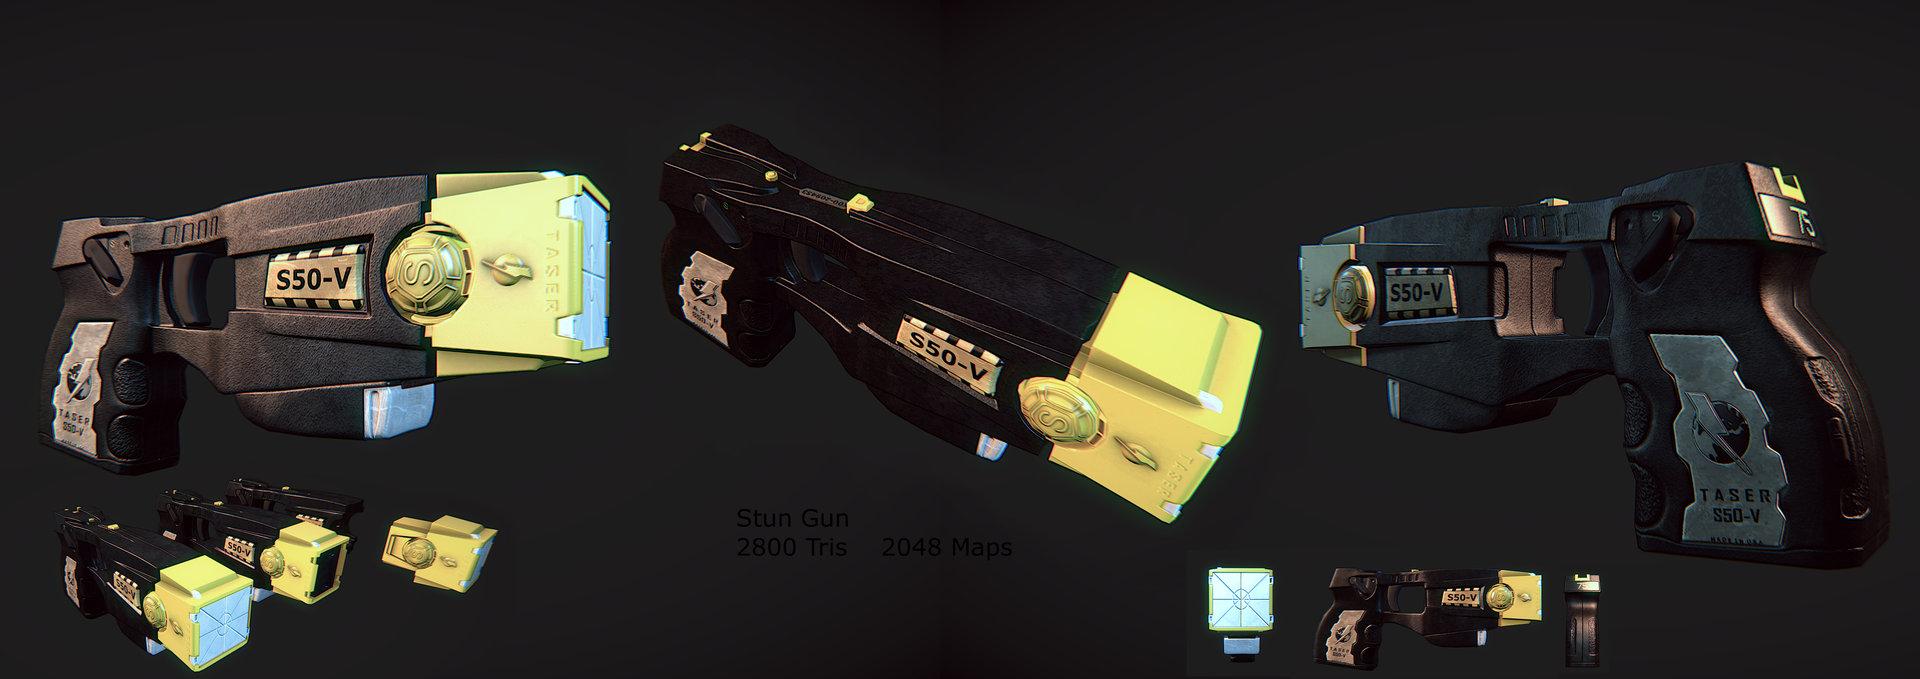 Stun gun 1